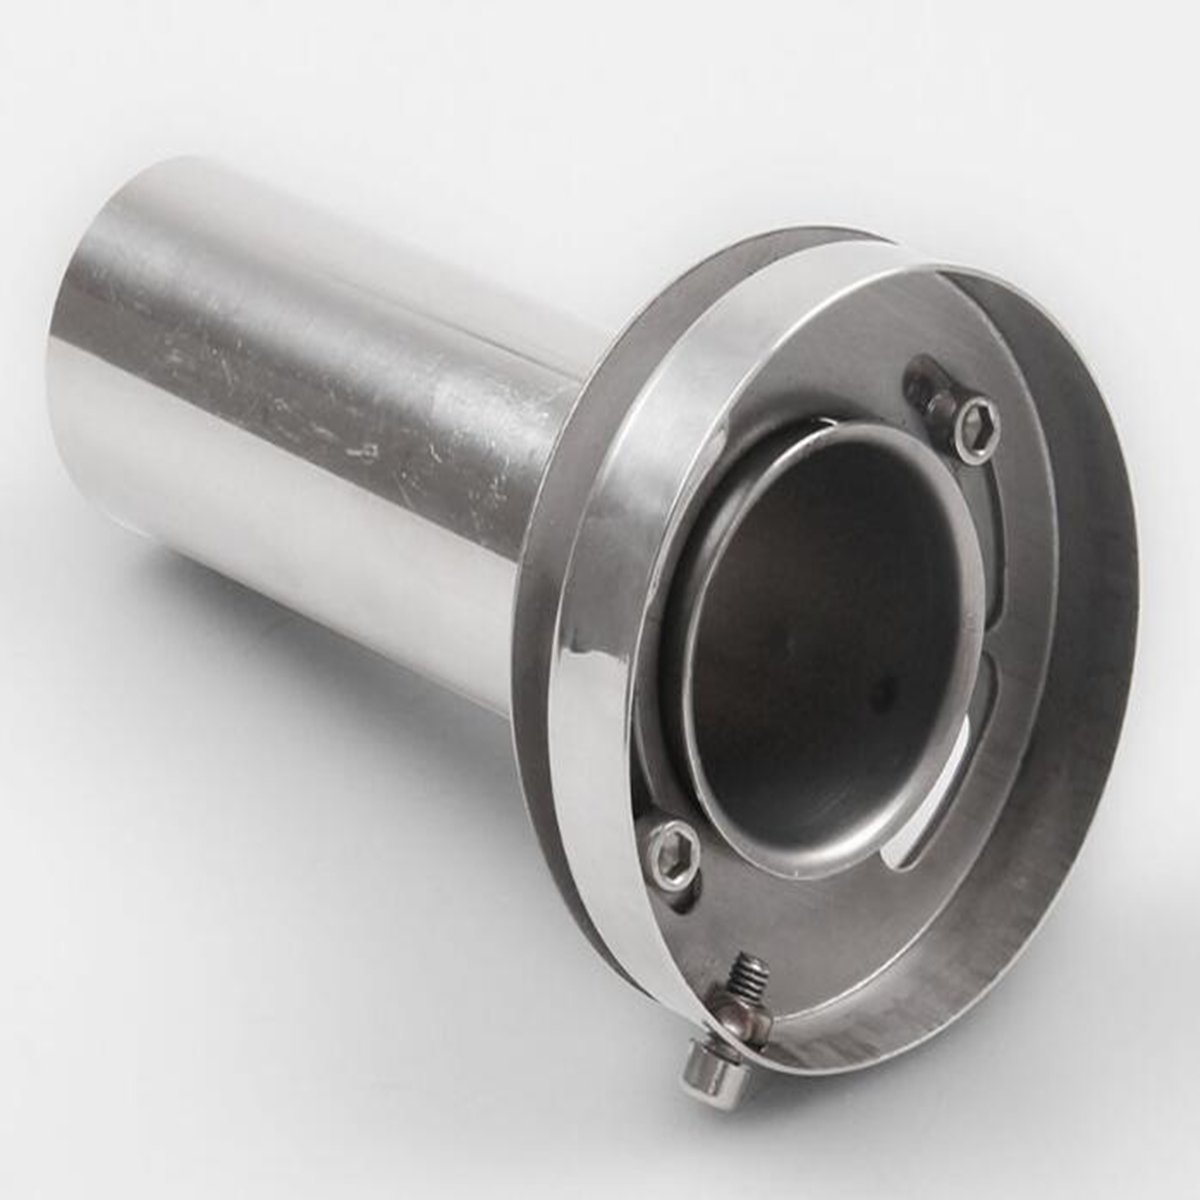 SUNDELY® 4'' Universal Hi-Q Round Tip Exhaust Muffler insert Removable Silencer Stainless 493316